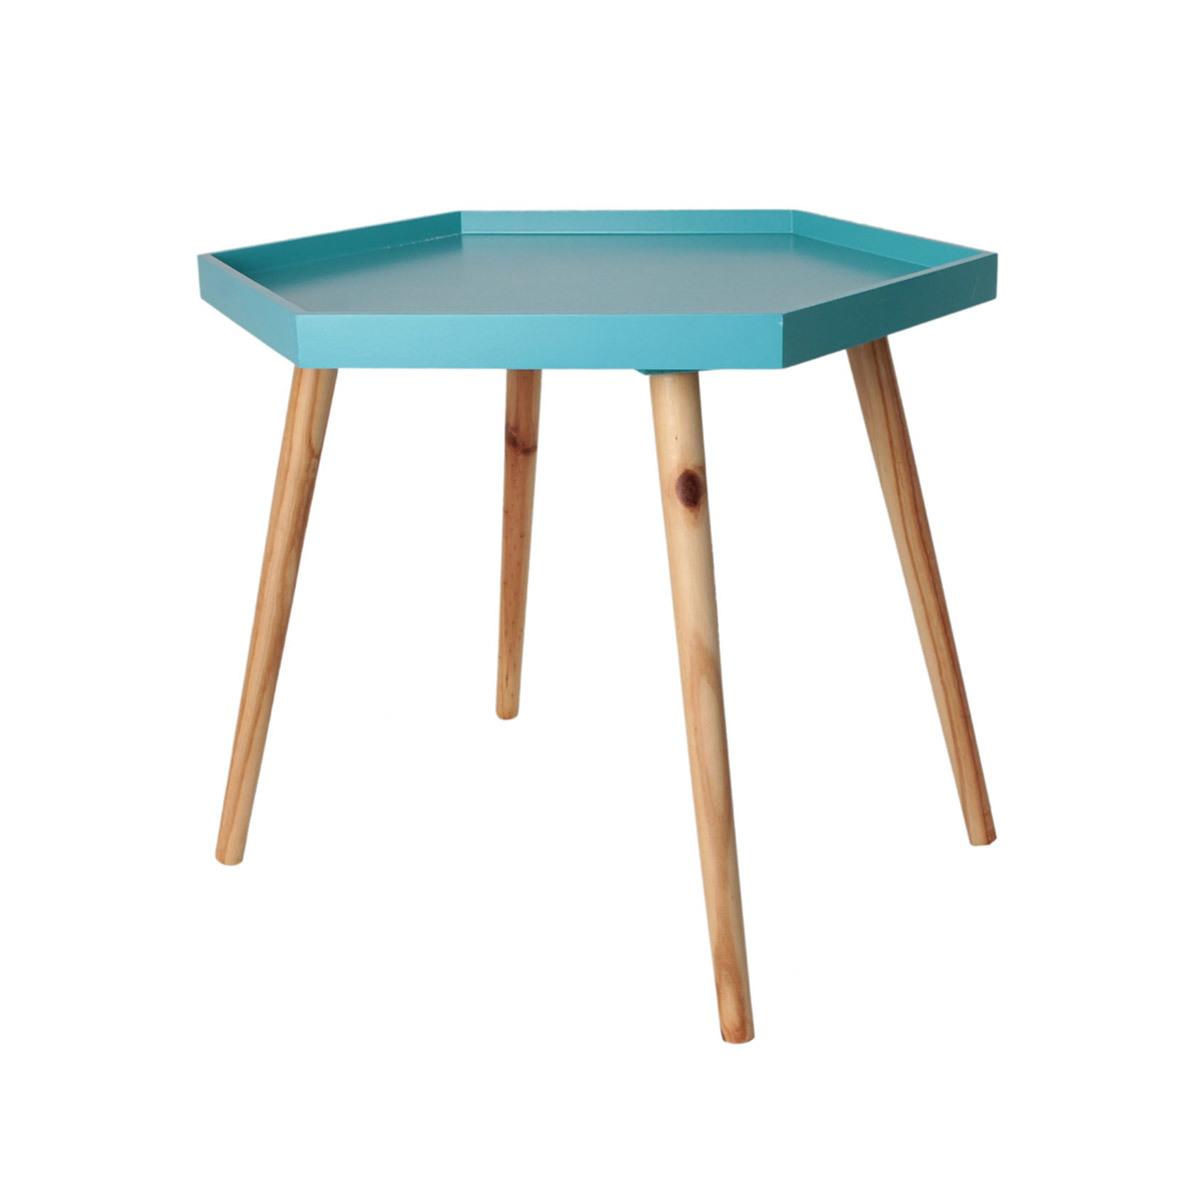 pieds de table amovibles simple tabouret tiptoe empilable chne massif vert tabouret lou tiptoe. Black Bedroom Furniture Sets. Home Design Ideas